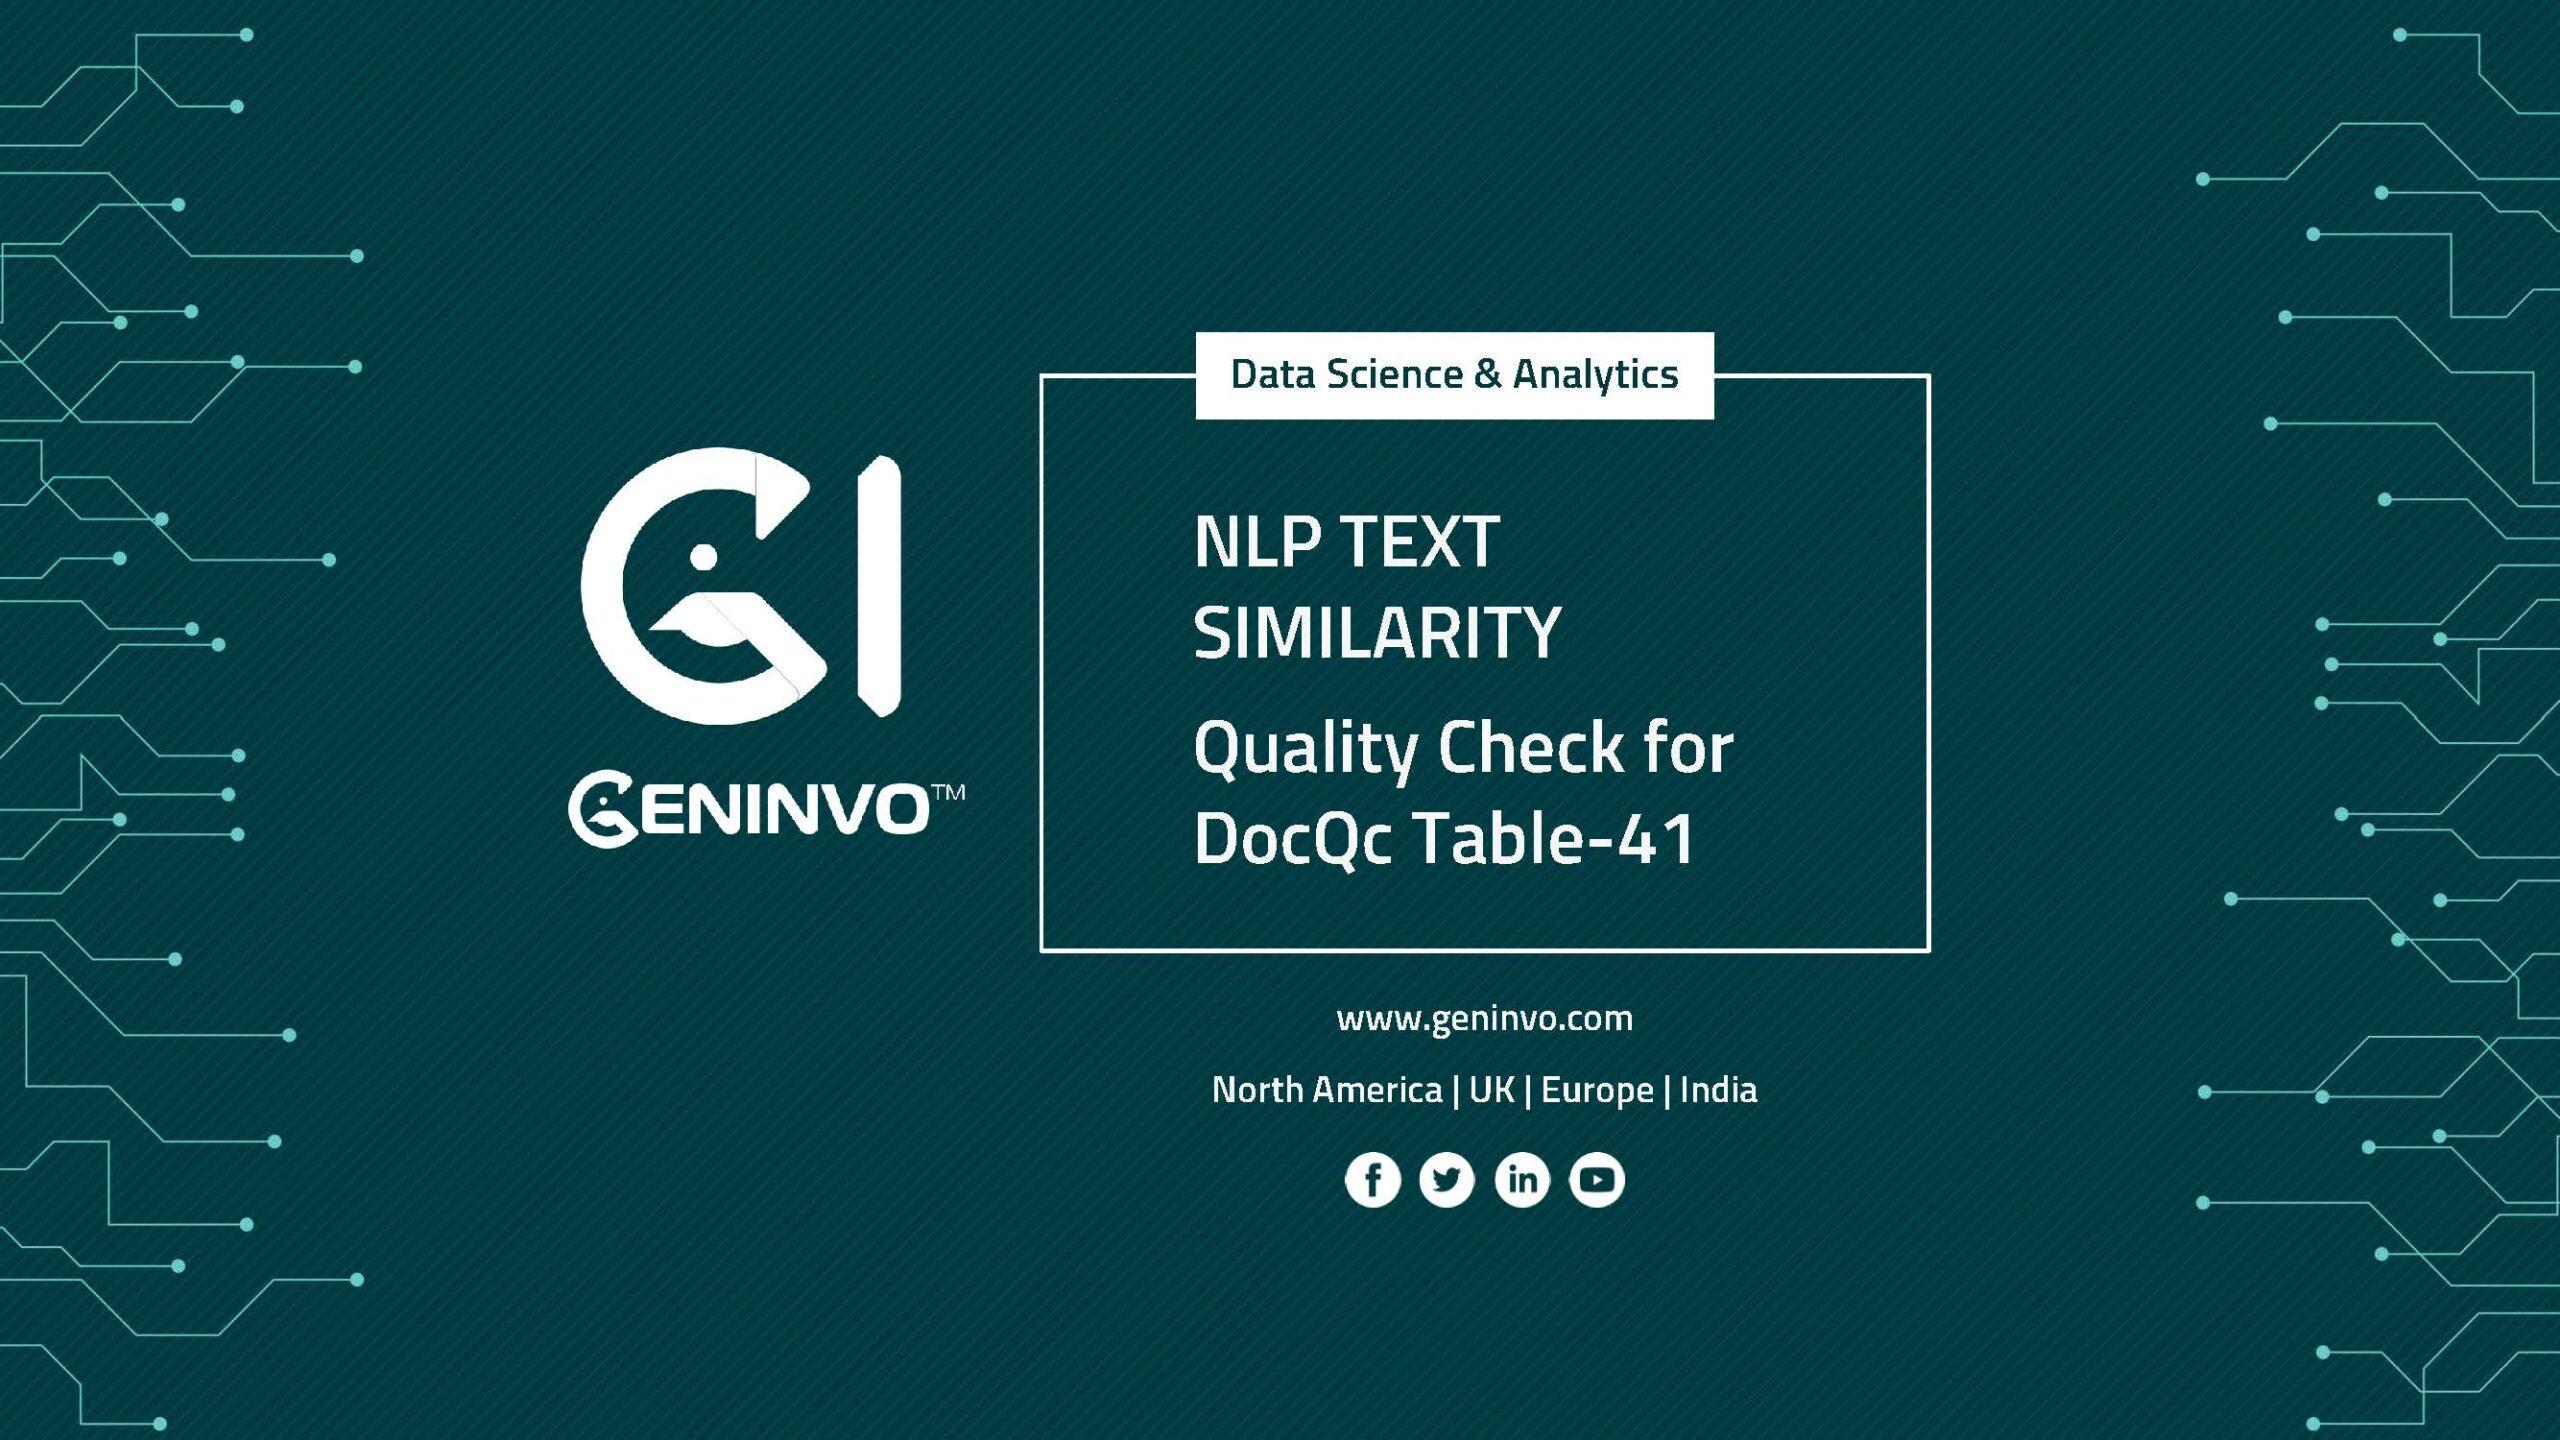 Case-Studies-11-DocQc-Table-41-NLP-for-Text-Similarity_Strona_1.jpg